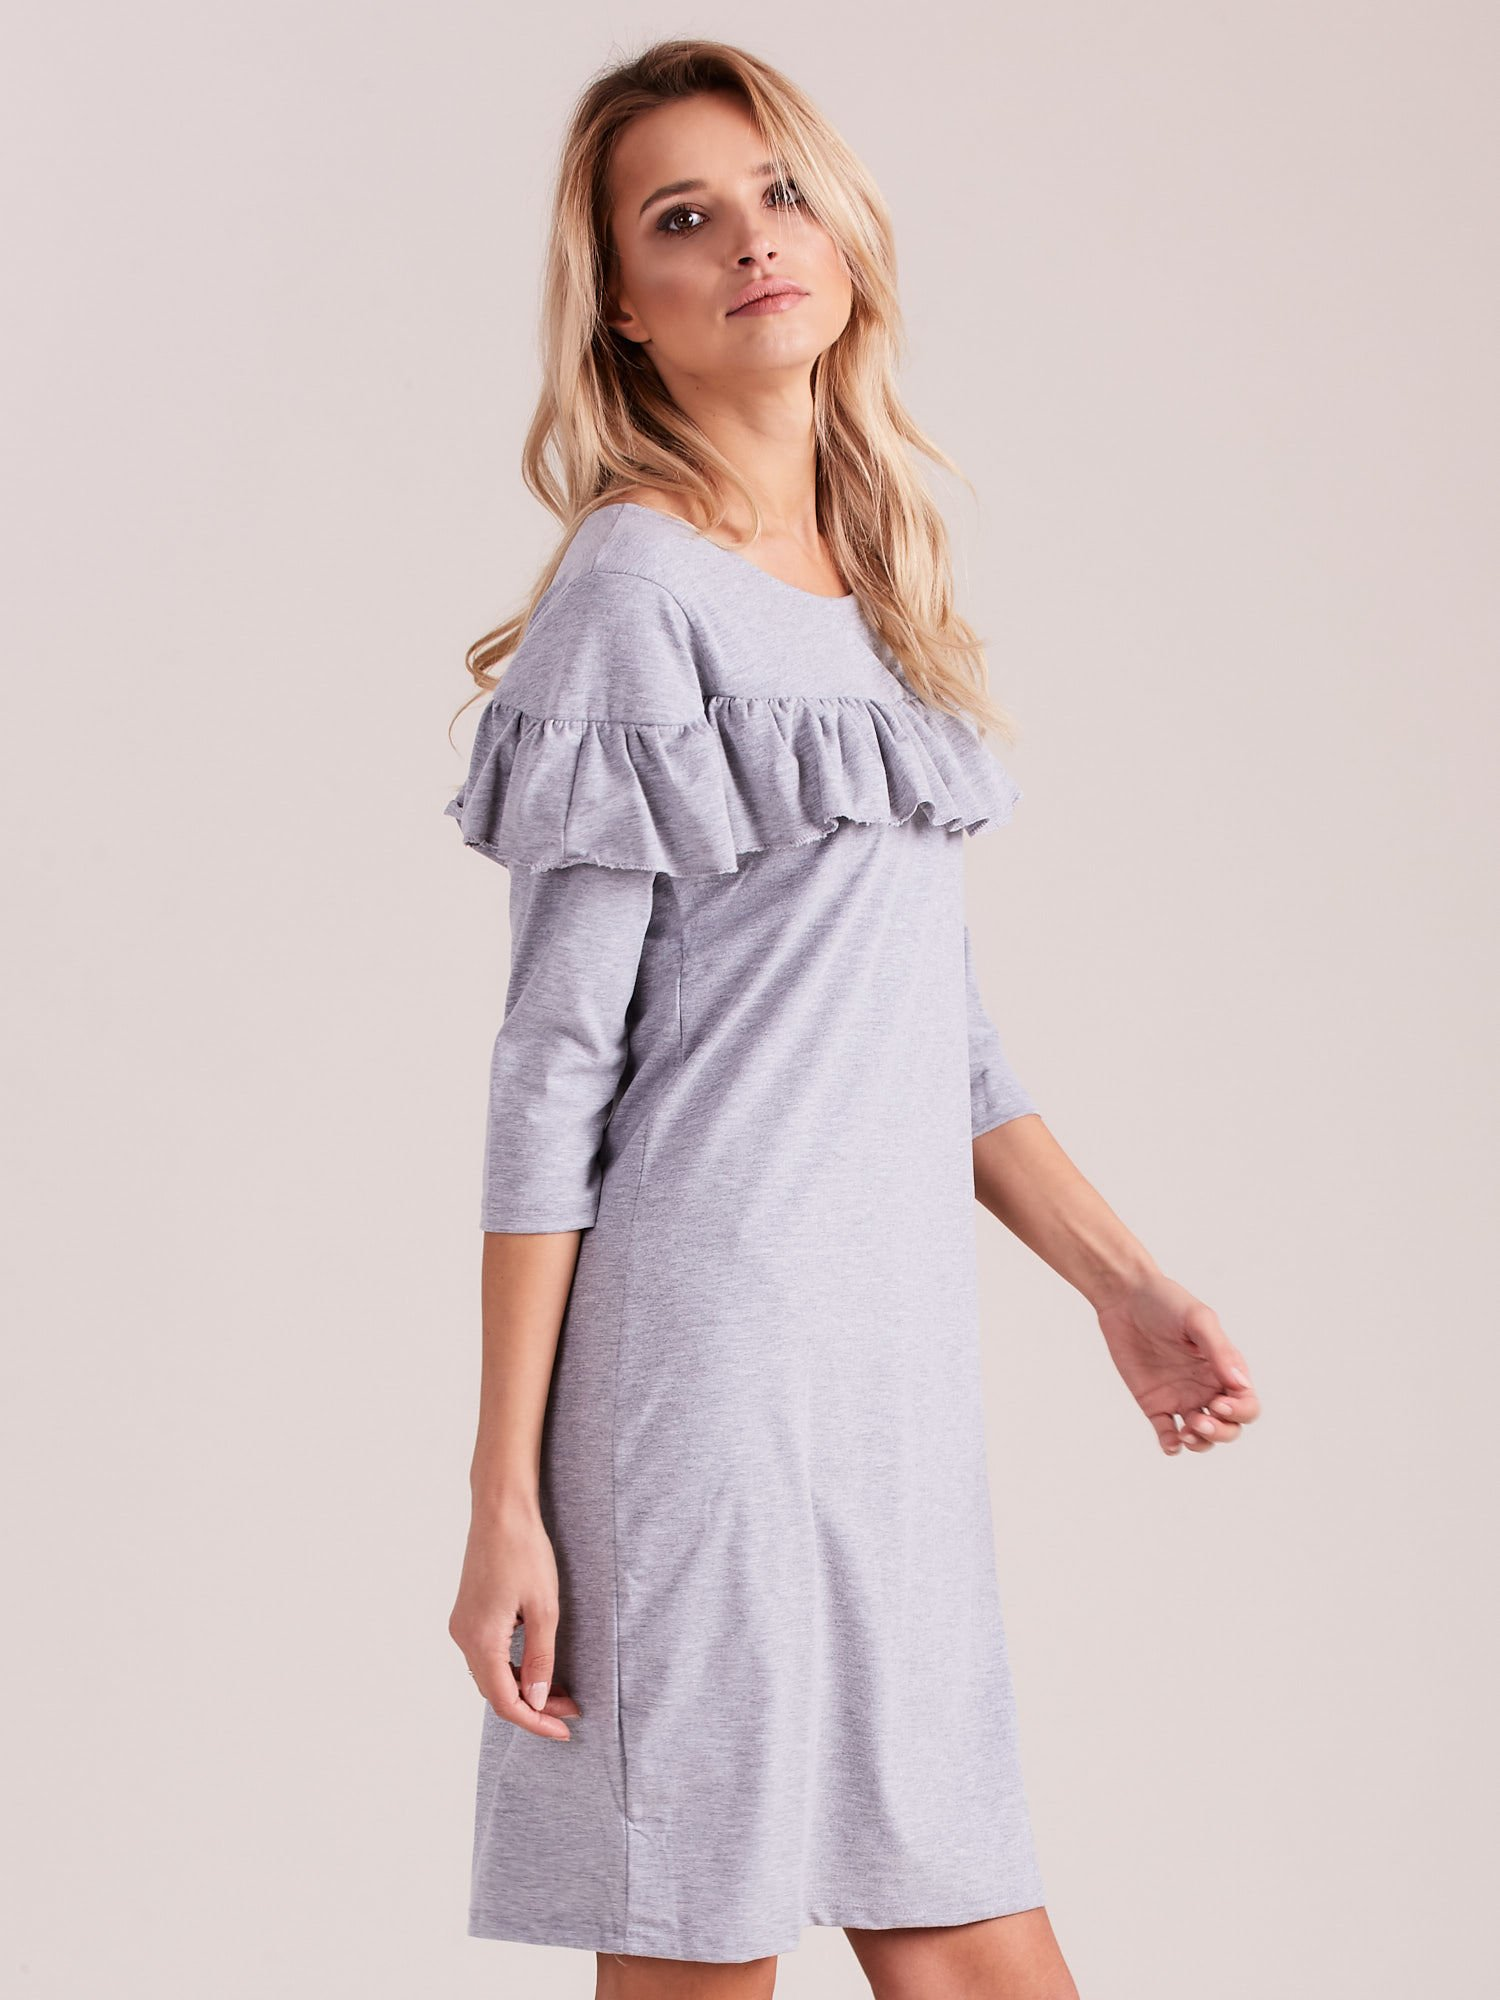 Sukienka jasnoszara z szeroką falbaną